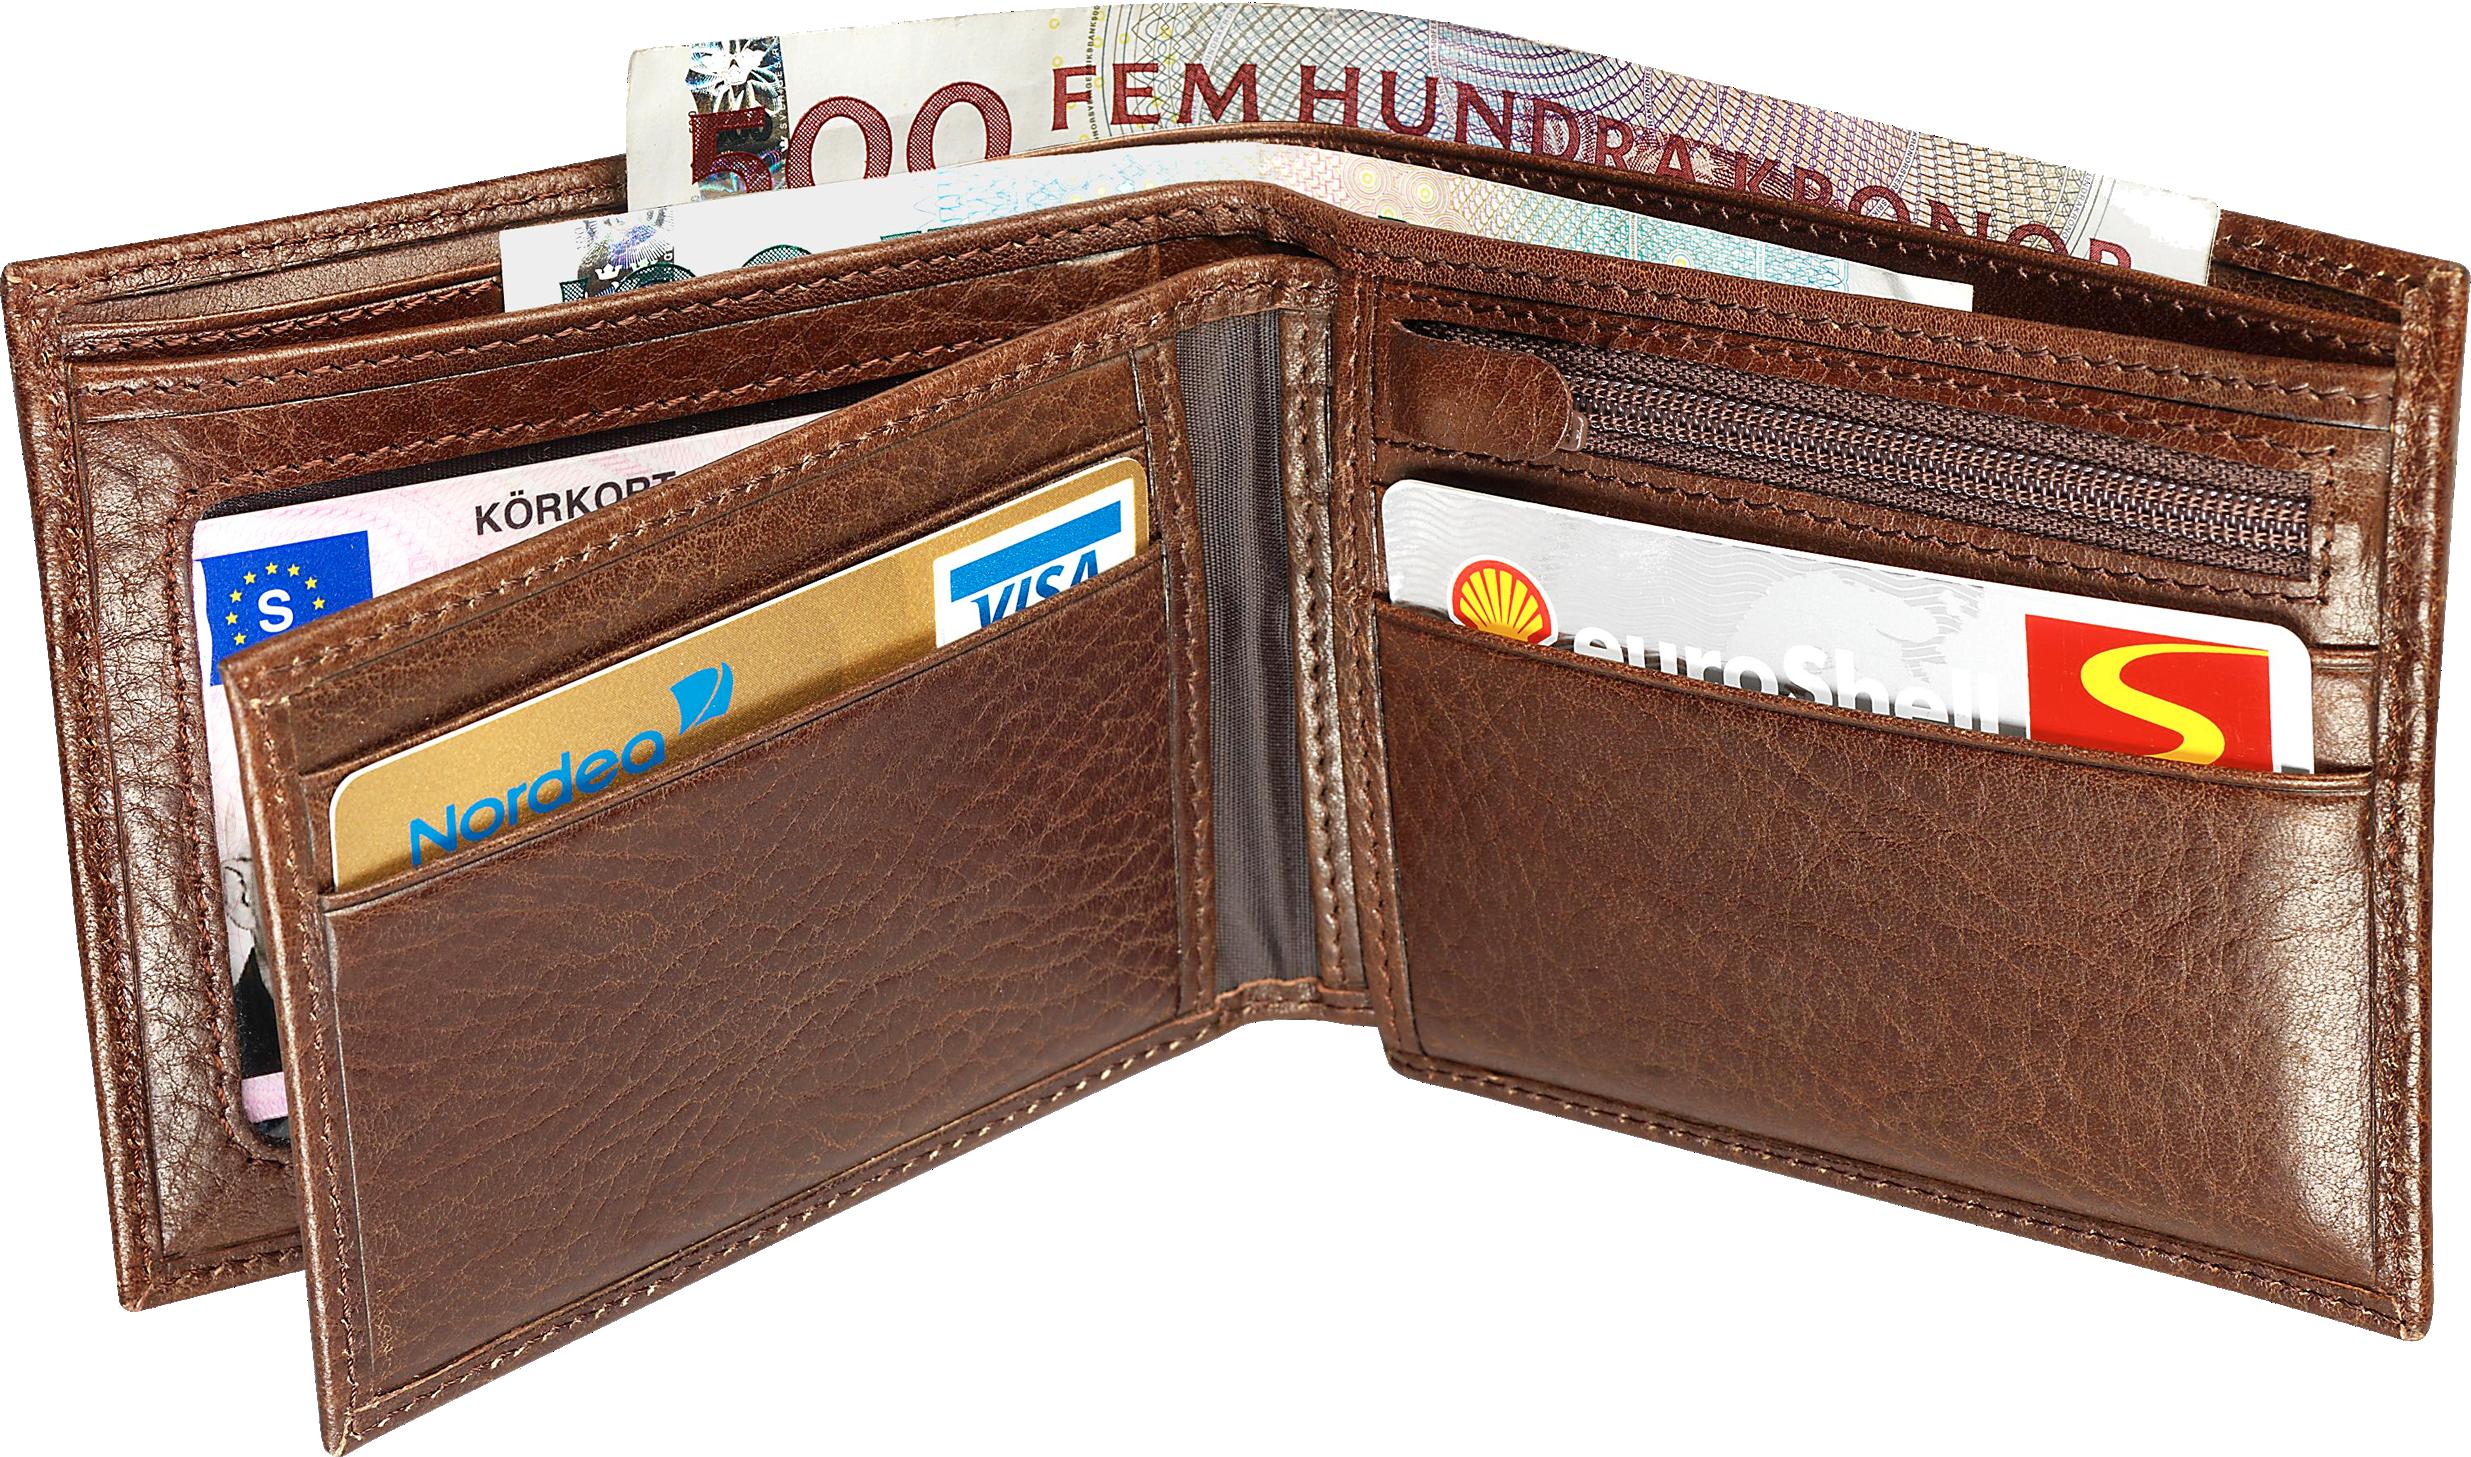 Wallet PNG - 2285